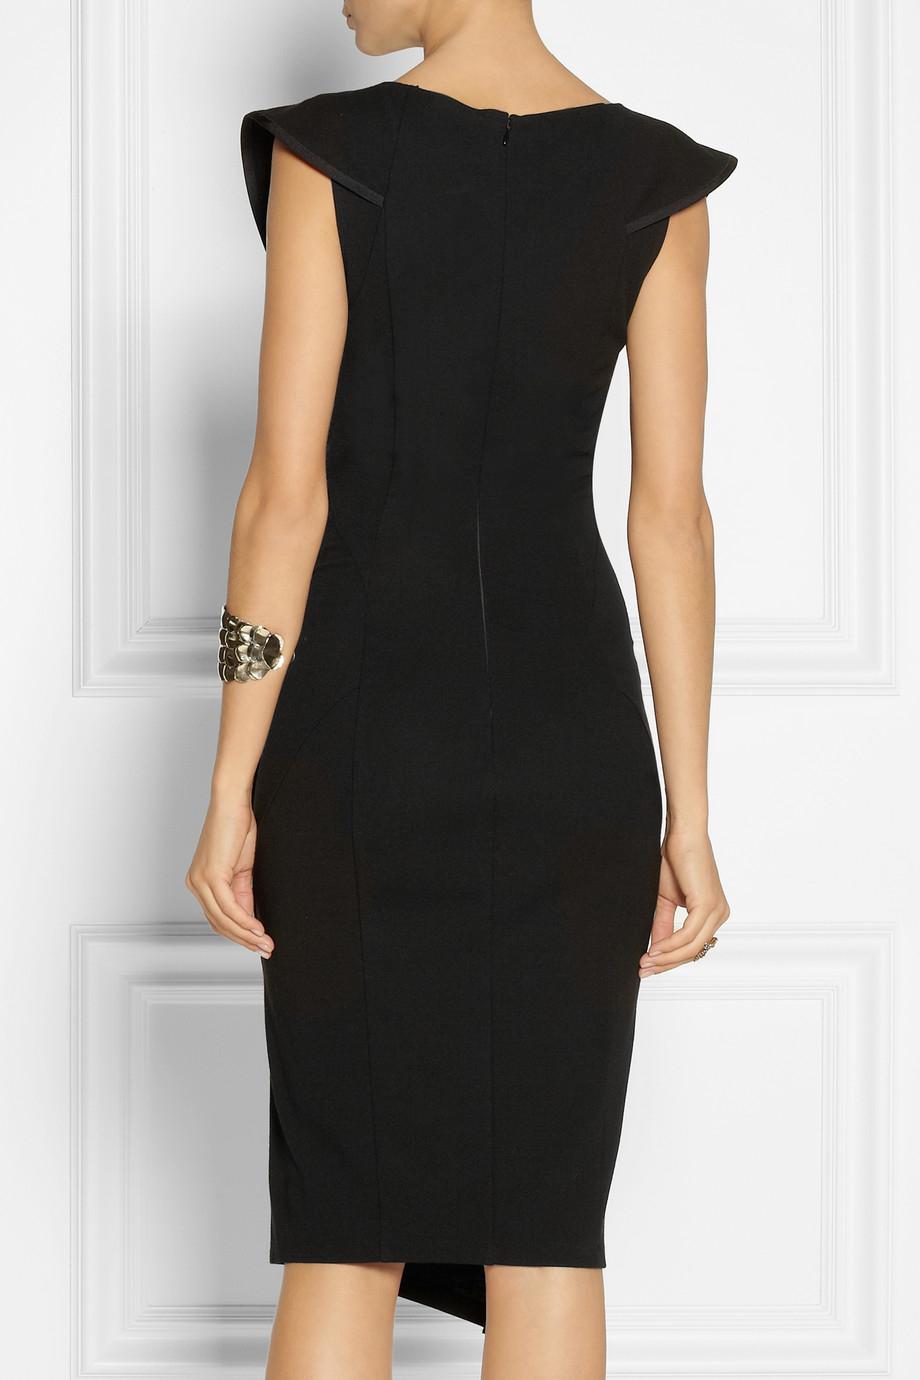 Donna Karan Modern Icons Stretch Jersey Dress In Black Lyst